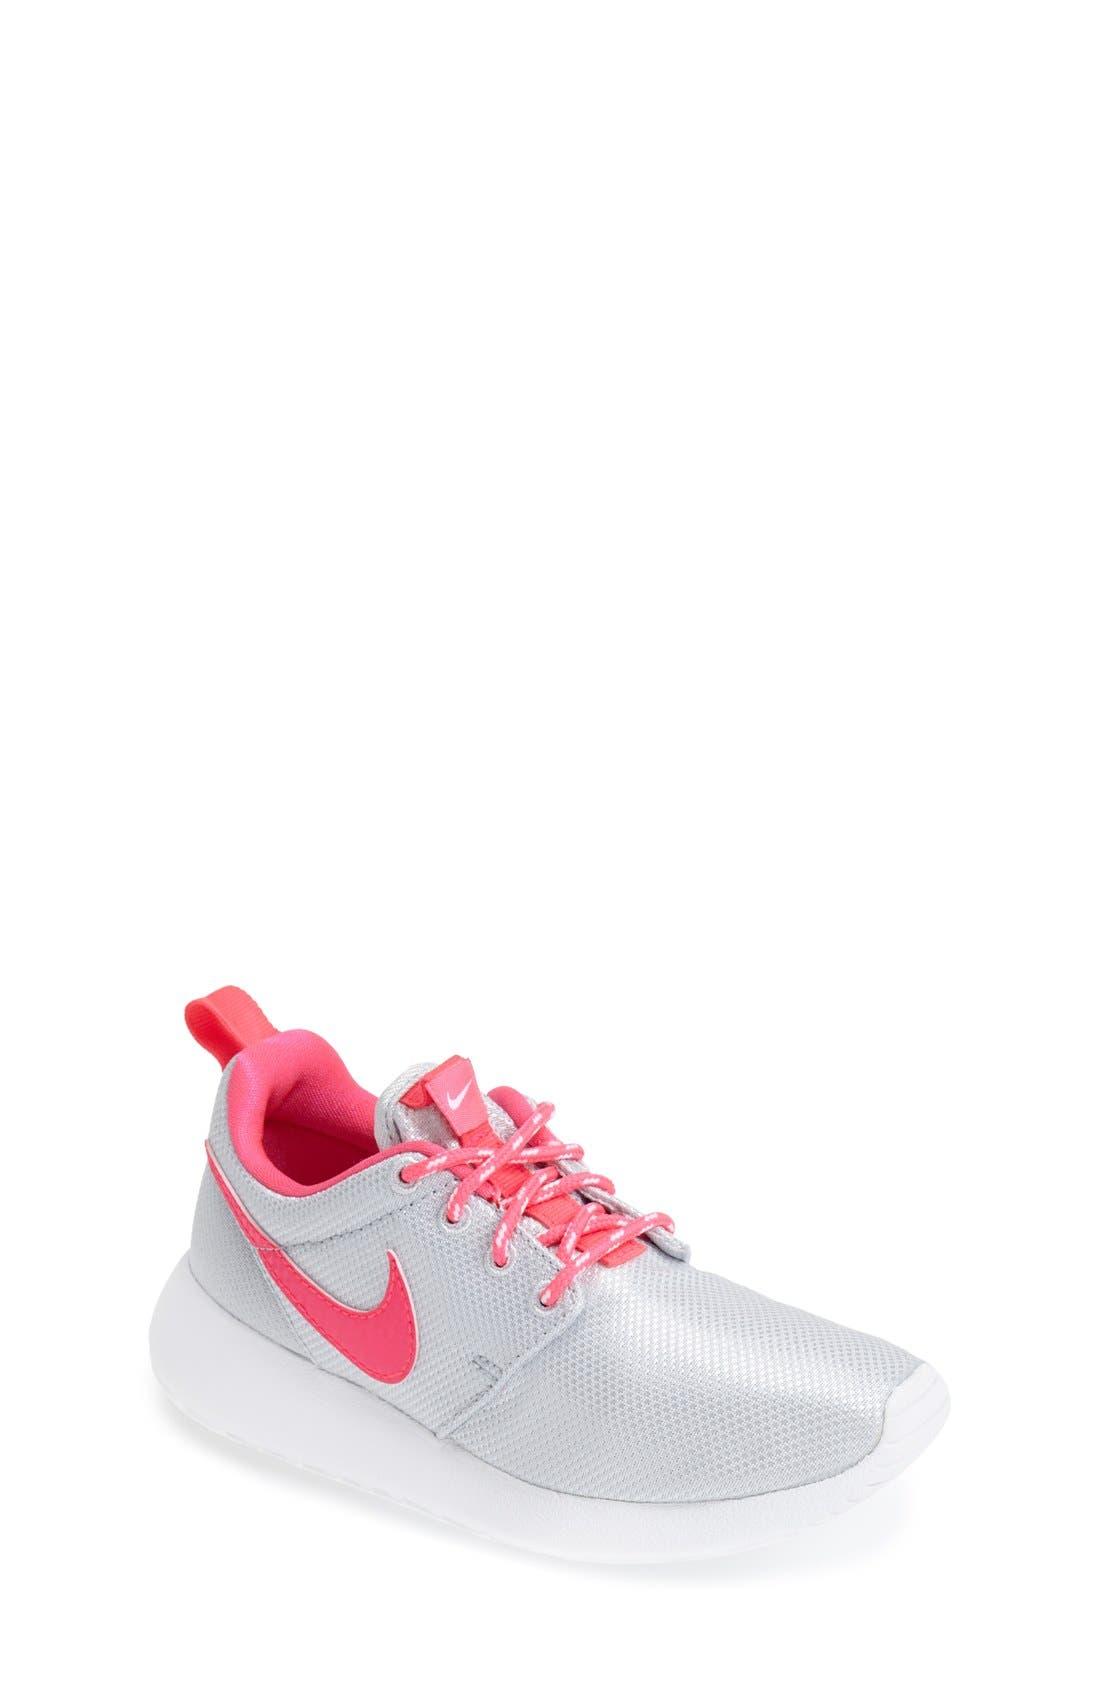 'Roshe Run' Athletic Shoe,                             Main thumbnail 24, color,